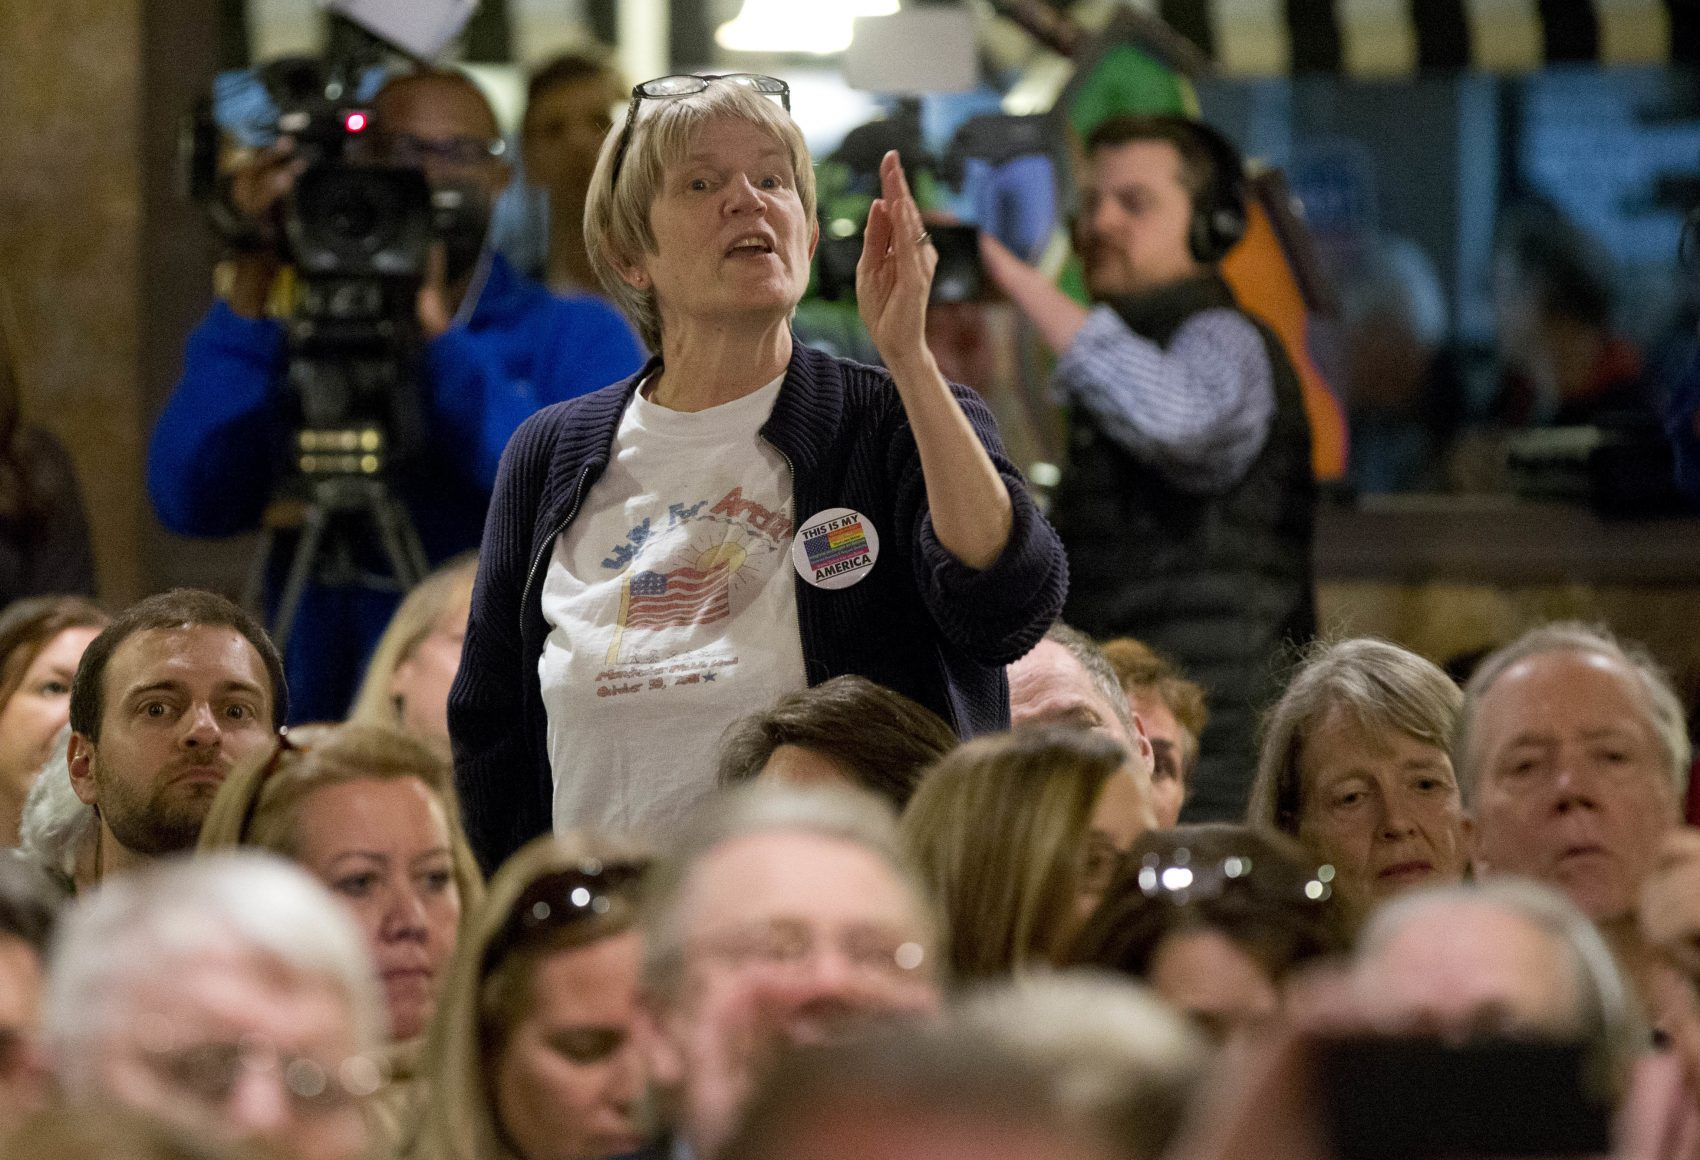 A constituent of congressman Dave Brat, R-Va., responds to the congressman during a town hall meeting in Blackstone, Va., Feb. 21, 2017. (Steve Helber/AP)